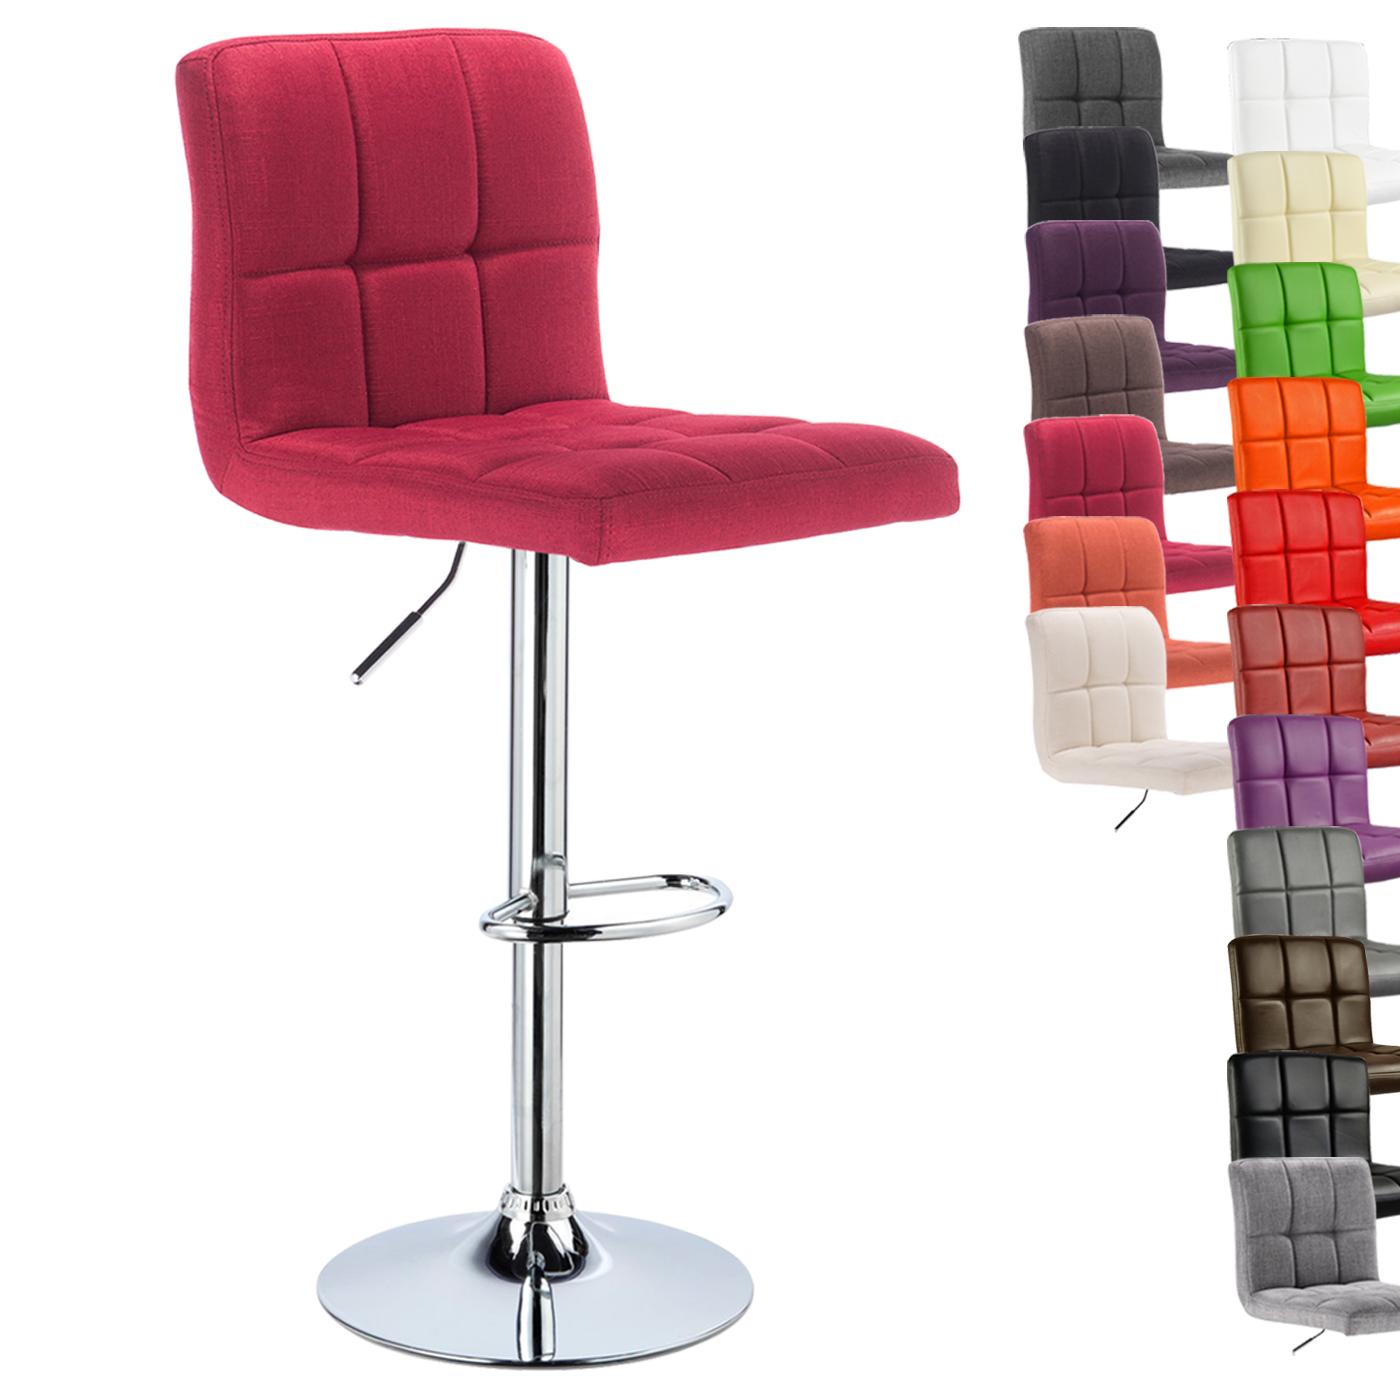 1 tabouret de bar r glable 360 rotation cuisine chaise en similicuir lin f070 ebay. Black Bedroom Furniture Sets. Home Design Ideas